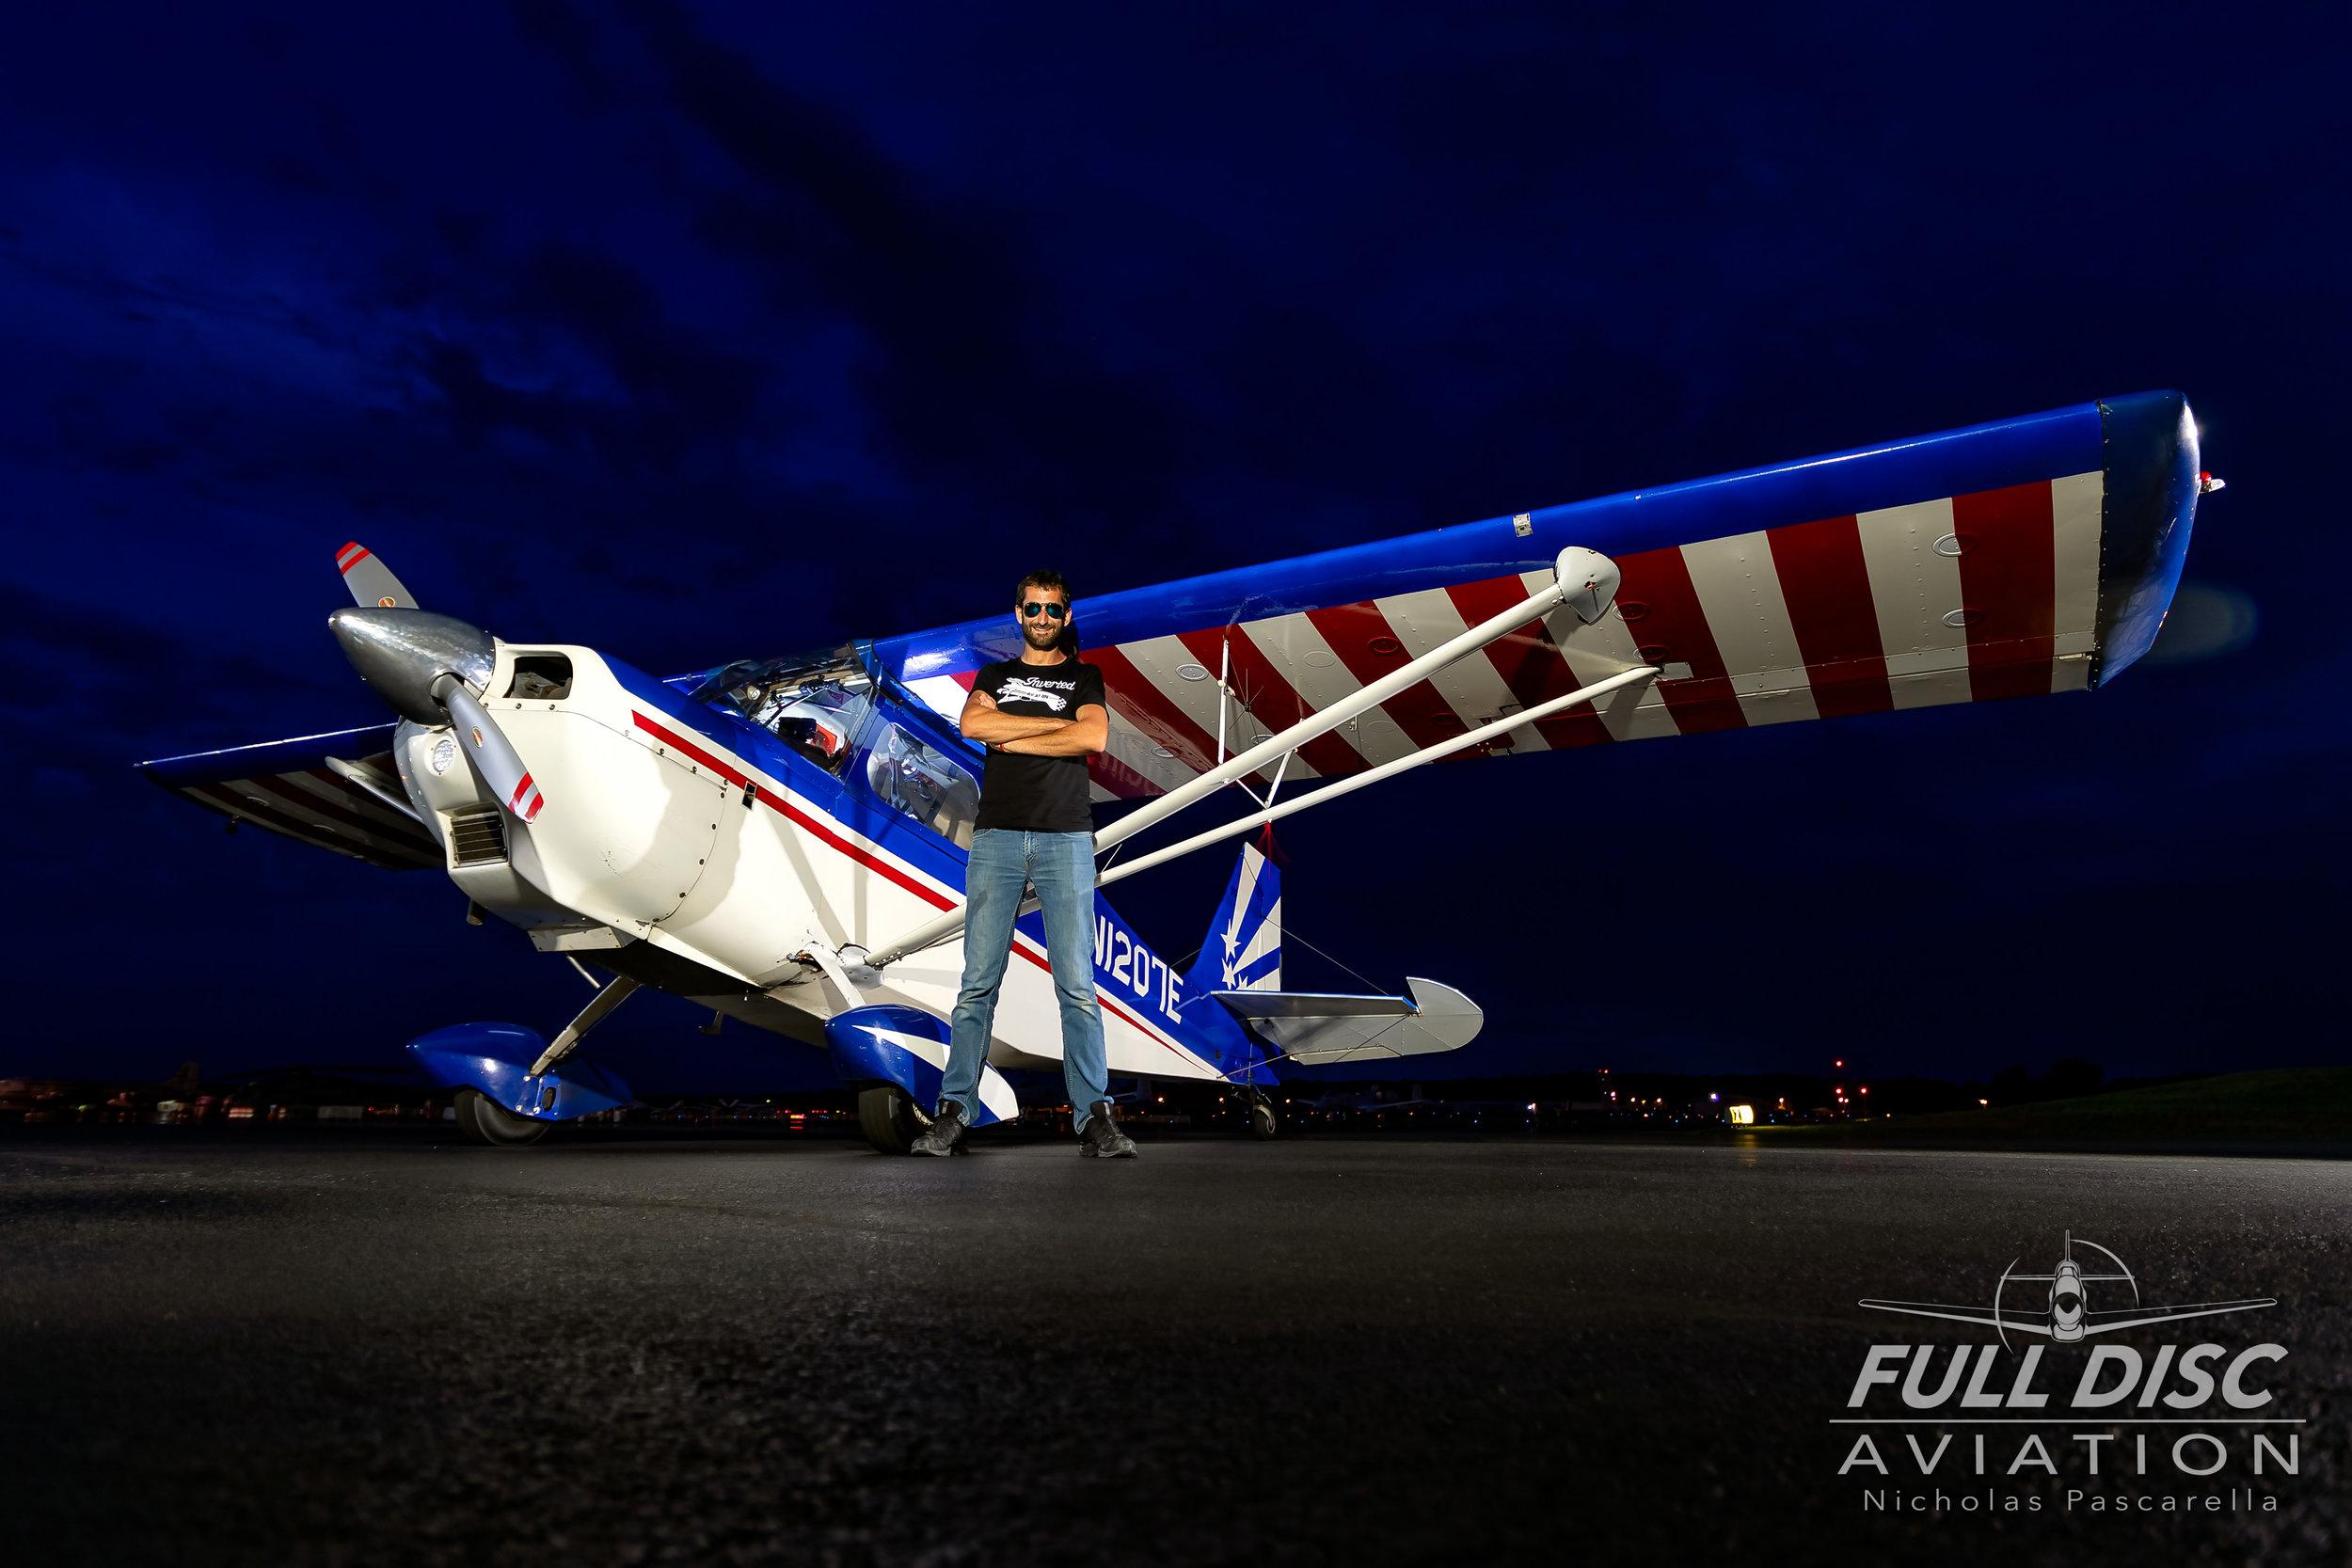 rjgritter_decathalon_pilot_portrait_nightshoot__aviation__nickpascarella_nicholaspascarella_fulldiscaviation_leasewebmanassasairshow.jpg